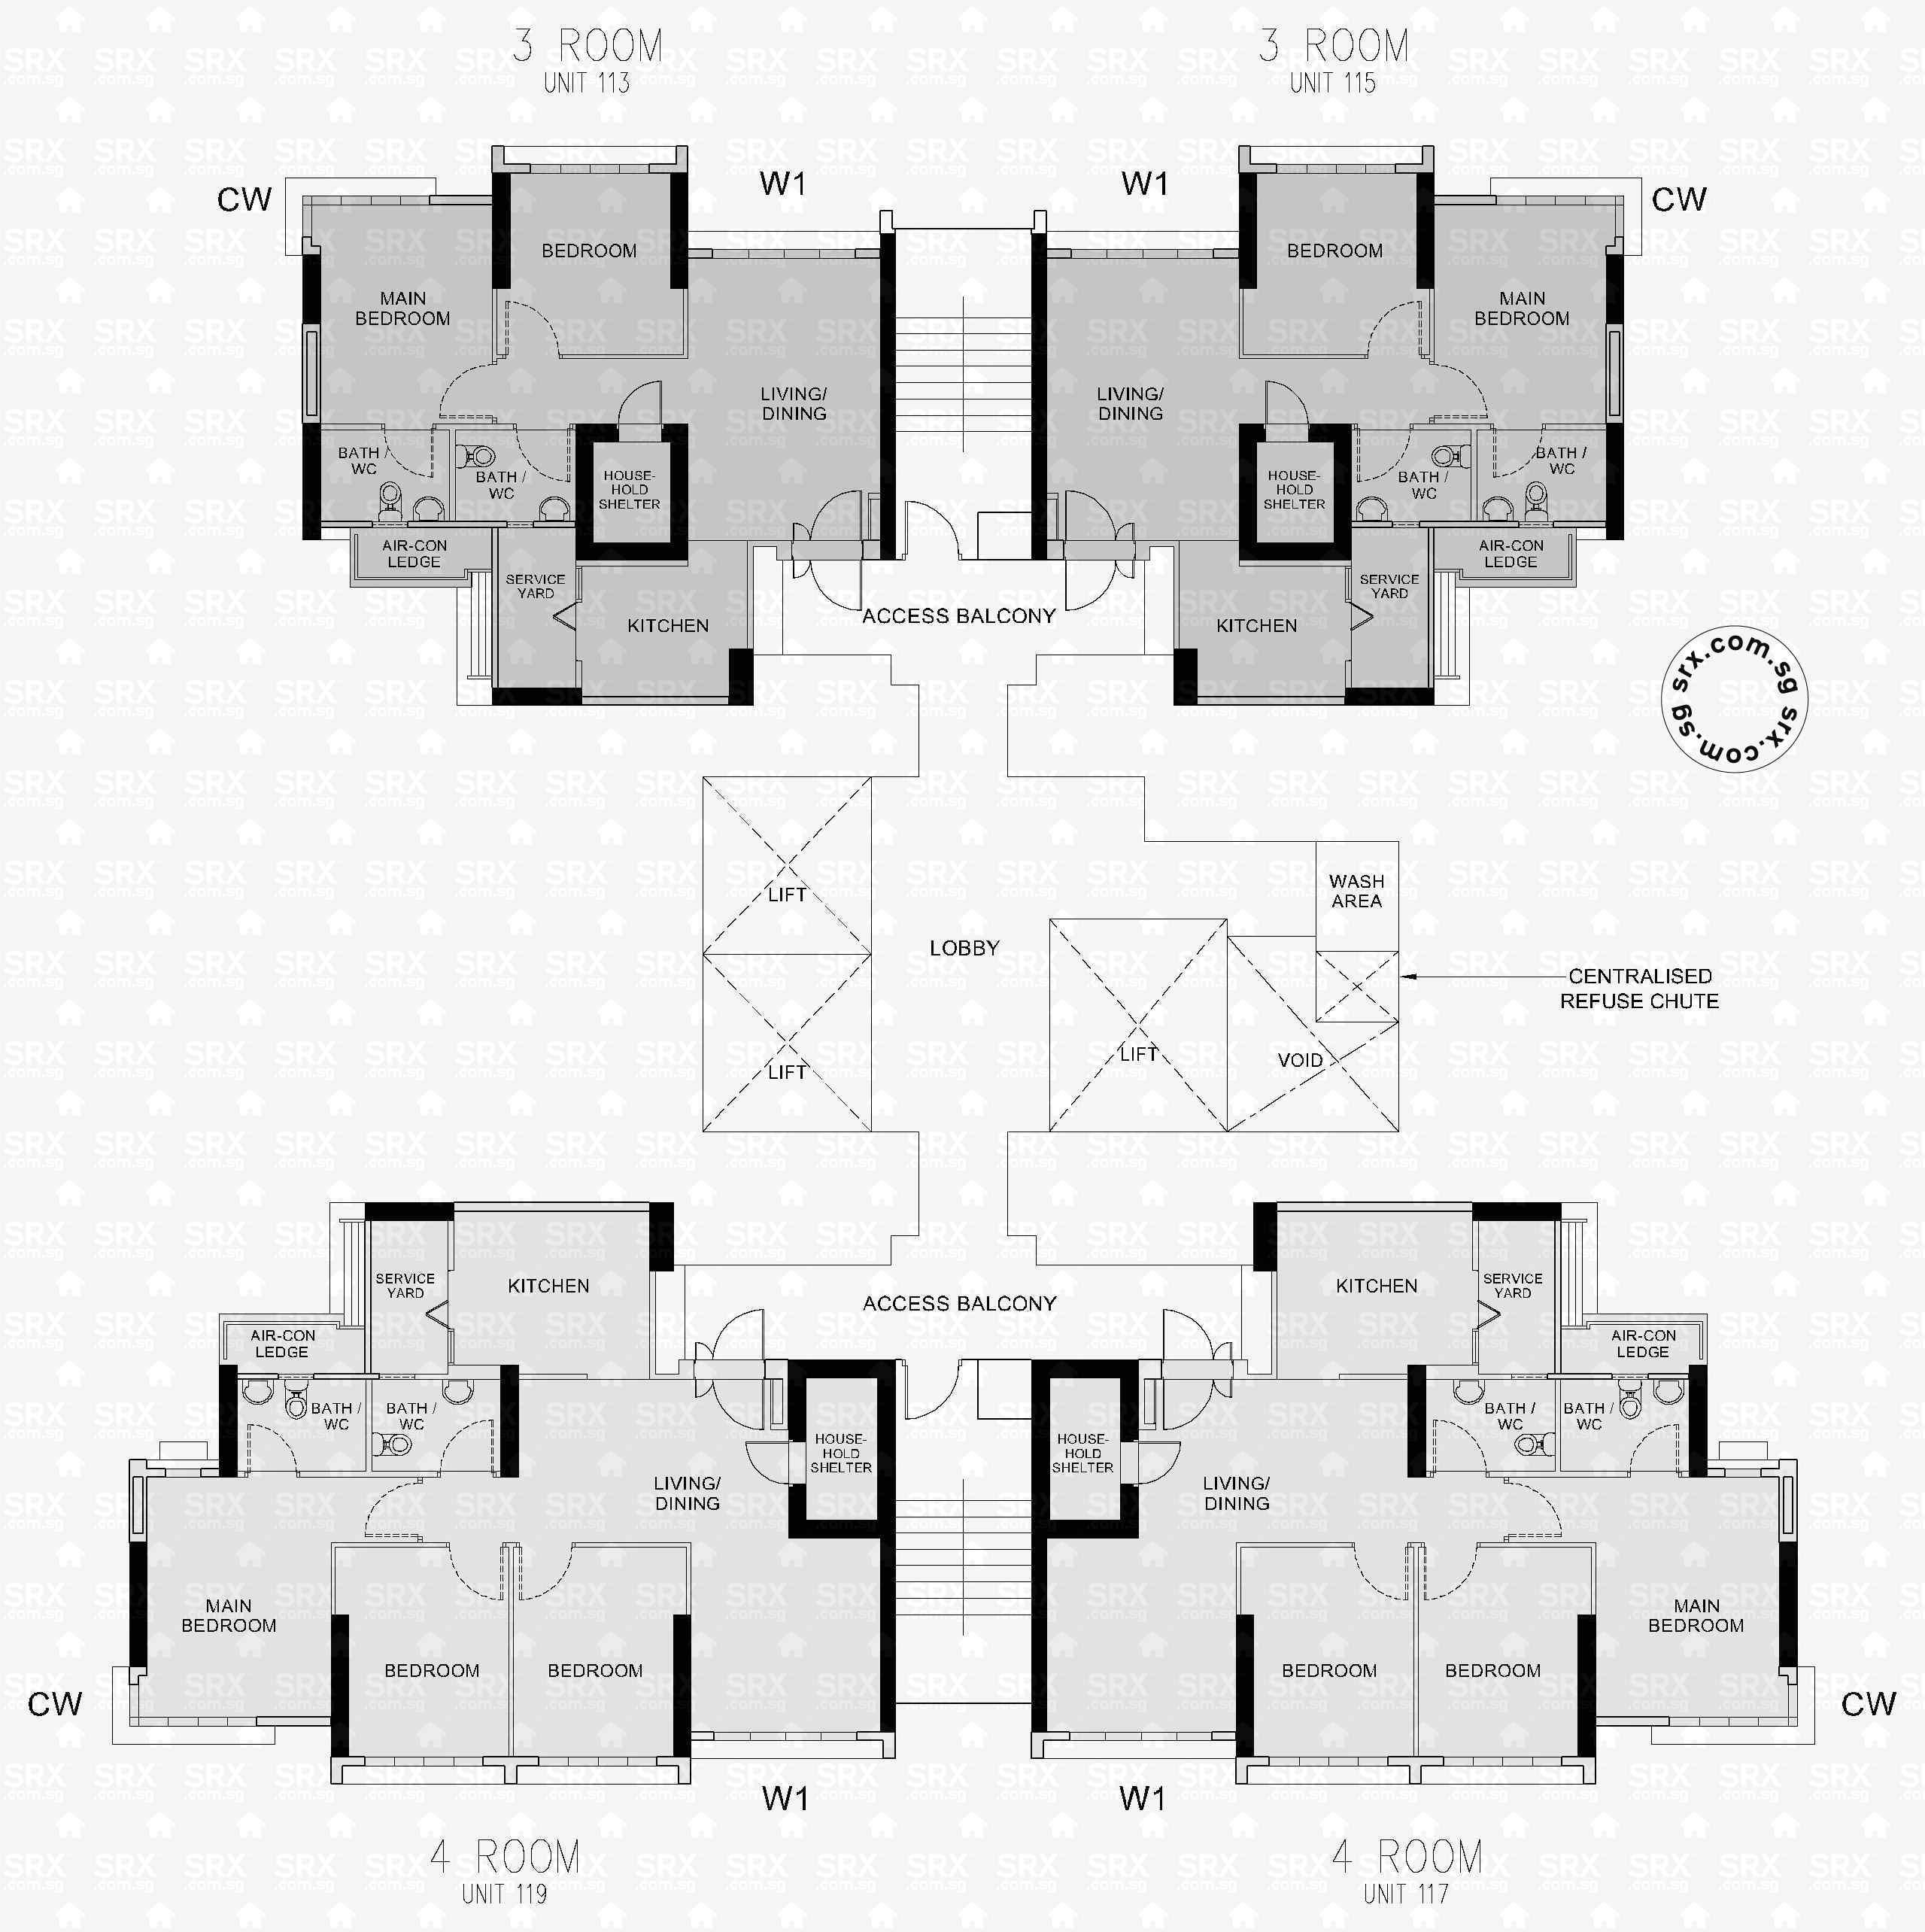 clementi avenue  hdb details  srx property - blk a floor  (actual)